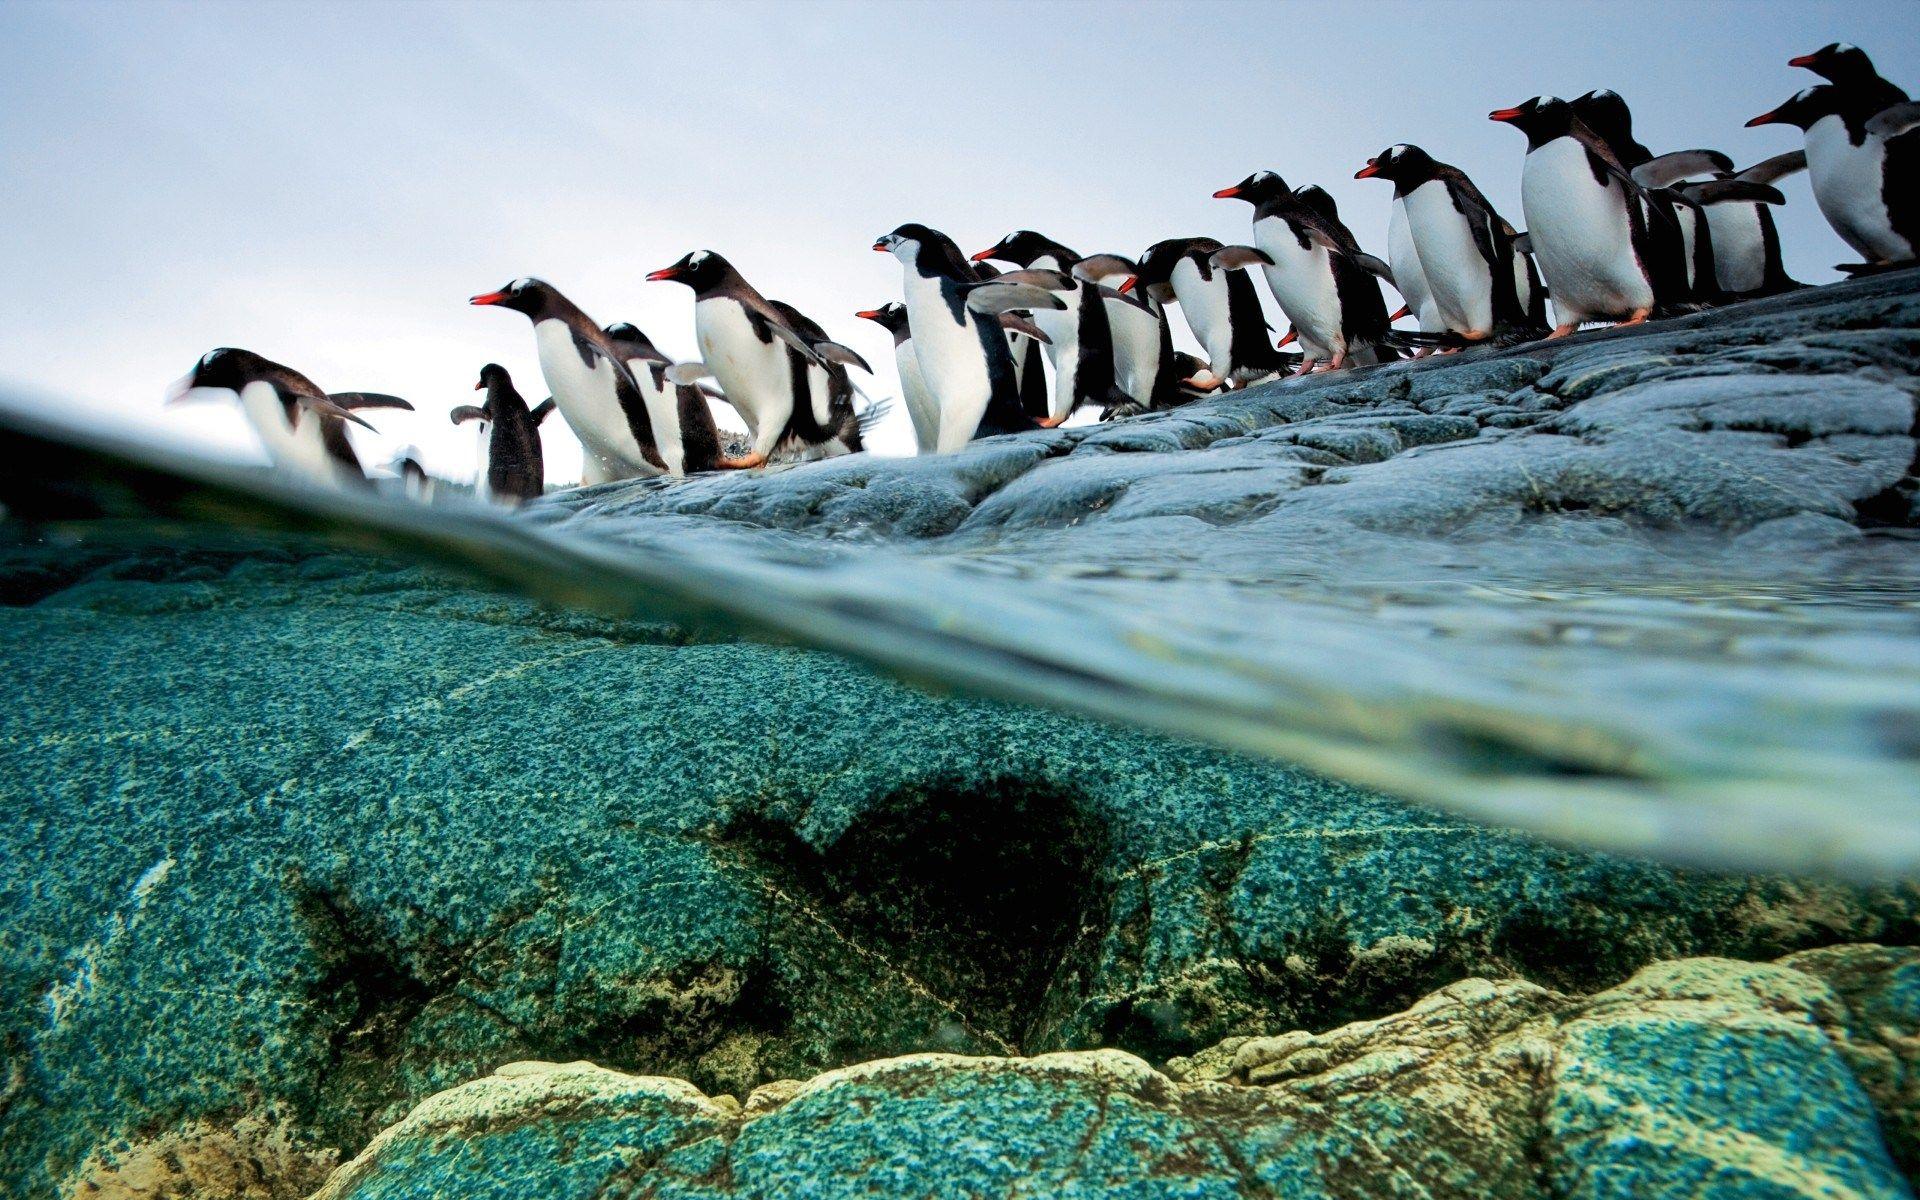 Most Beautiful Nat Geo Wild Wallpaper Nature Photographs Penguins National Geographic Photographers